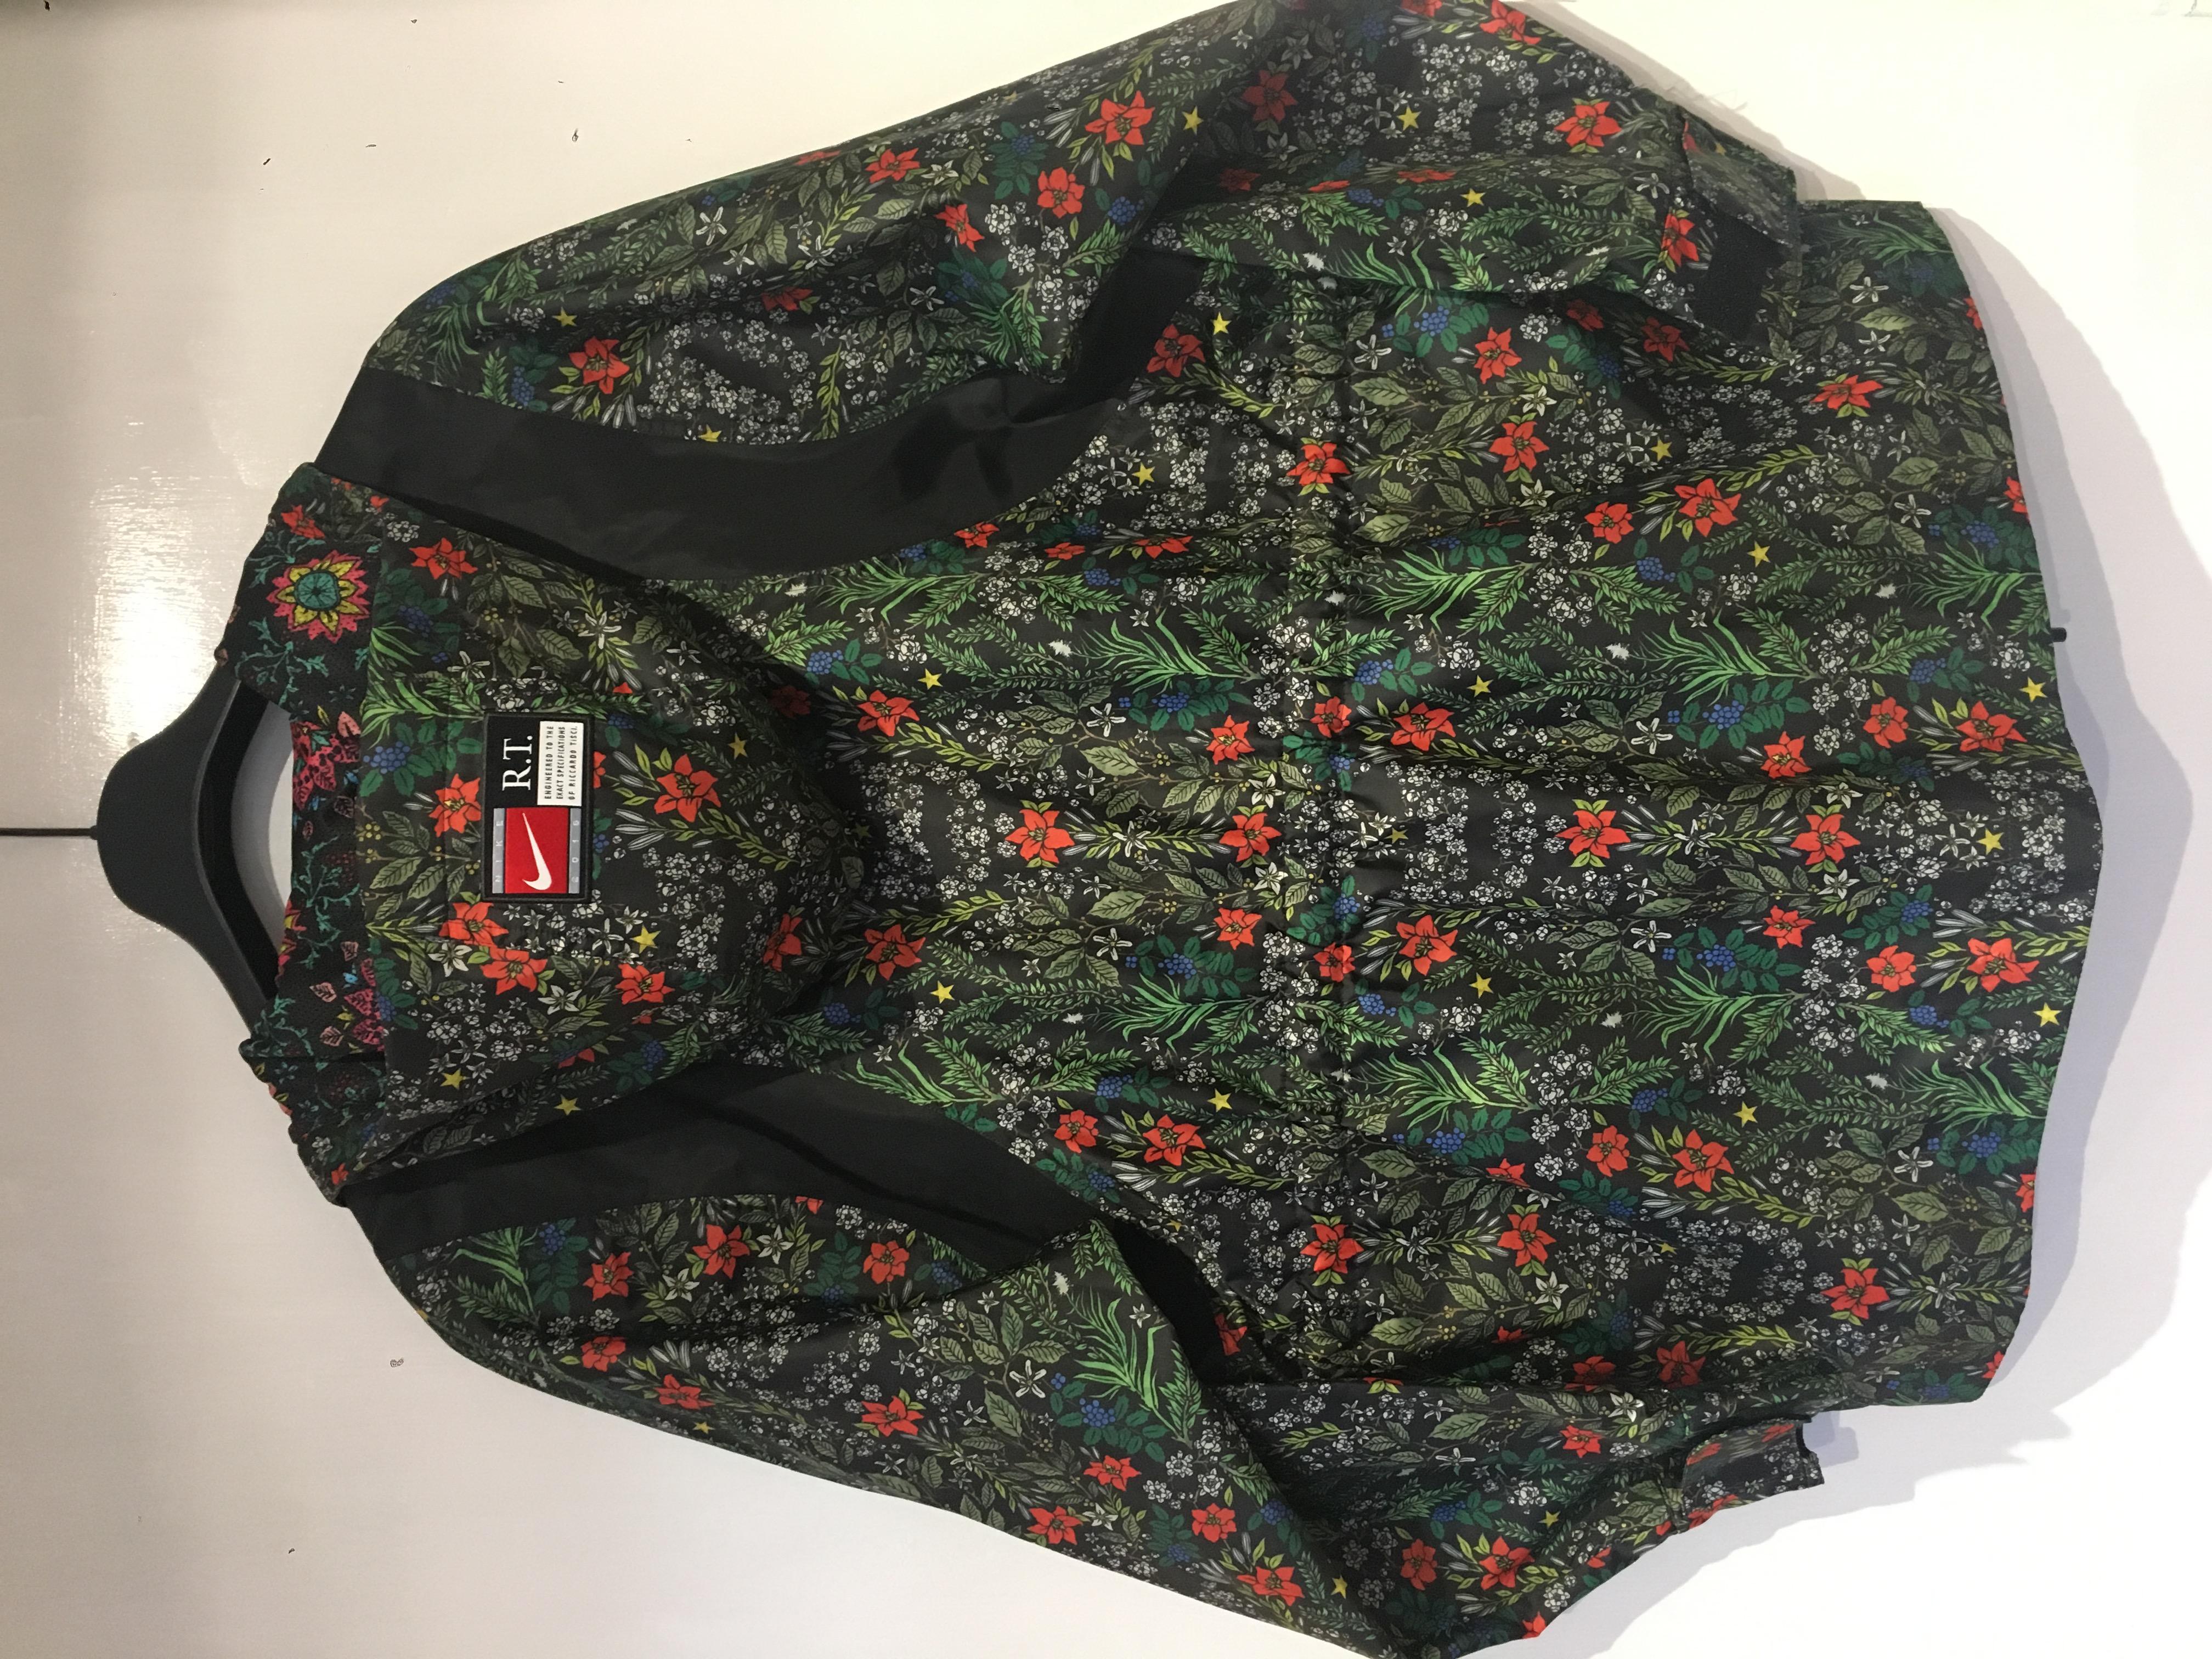 Nike NIKE NikeLab x RT Womens Floral Jacket (827069-010) riccardo ... 6b761aa31